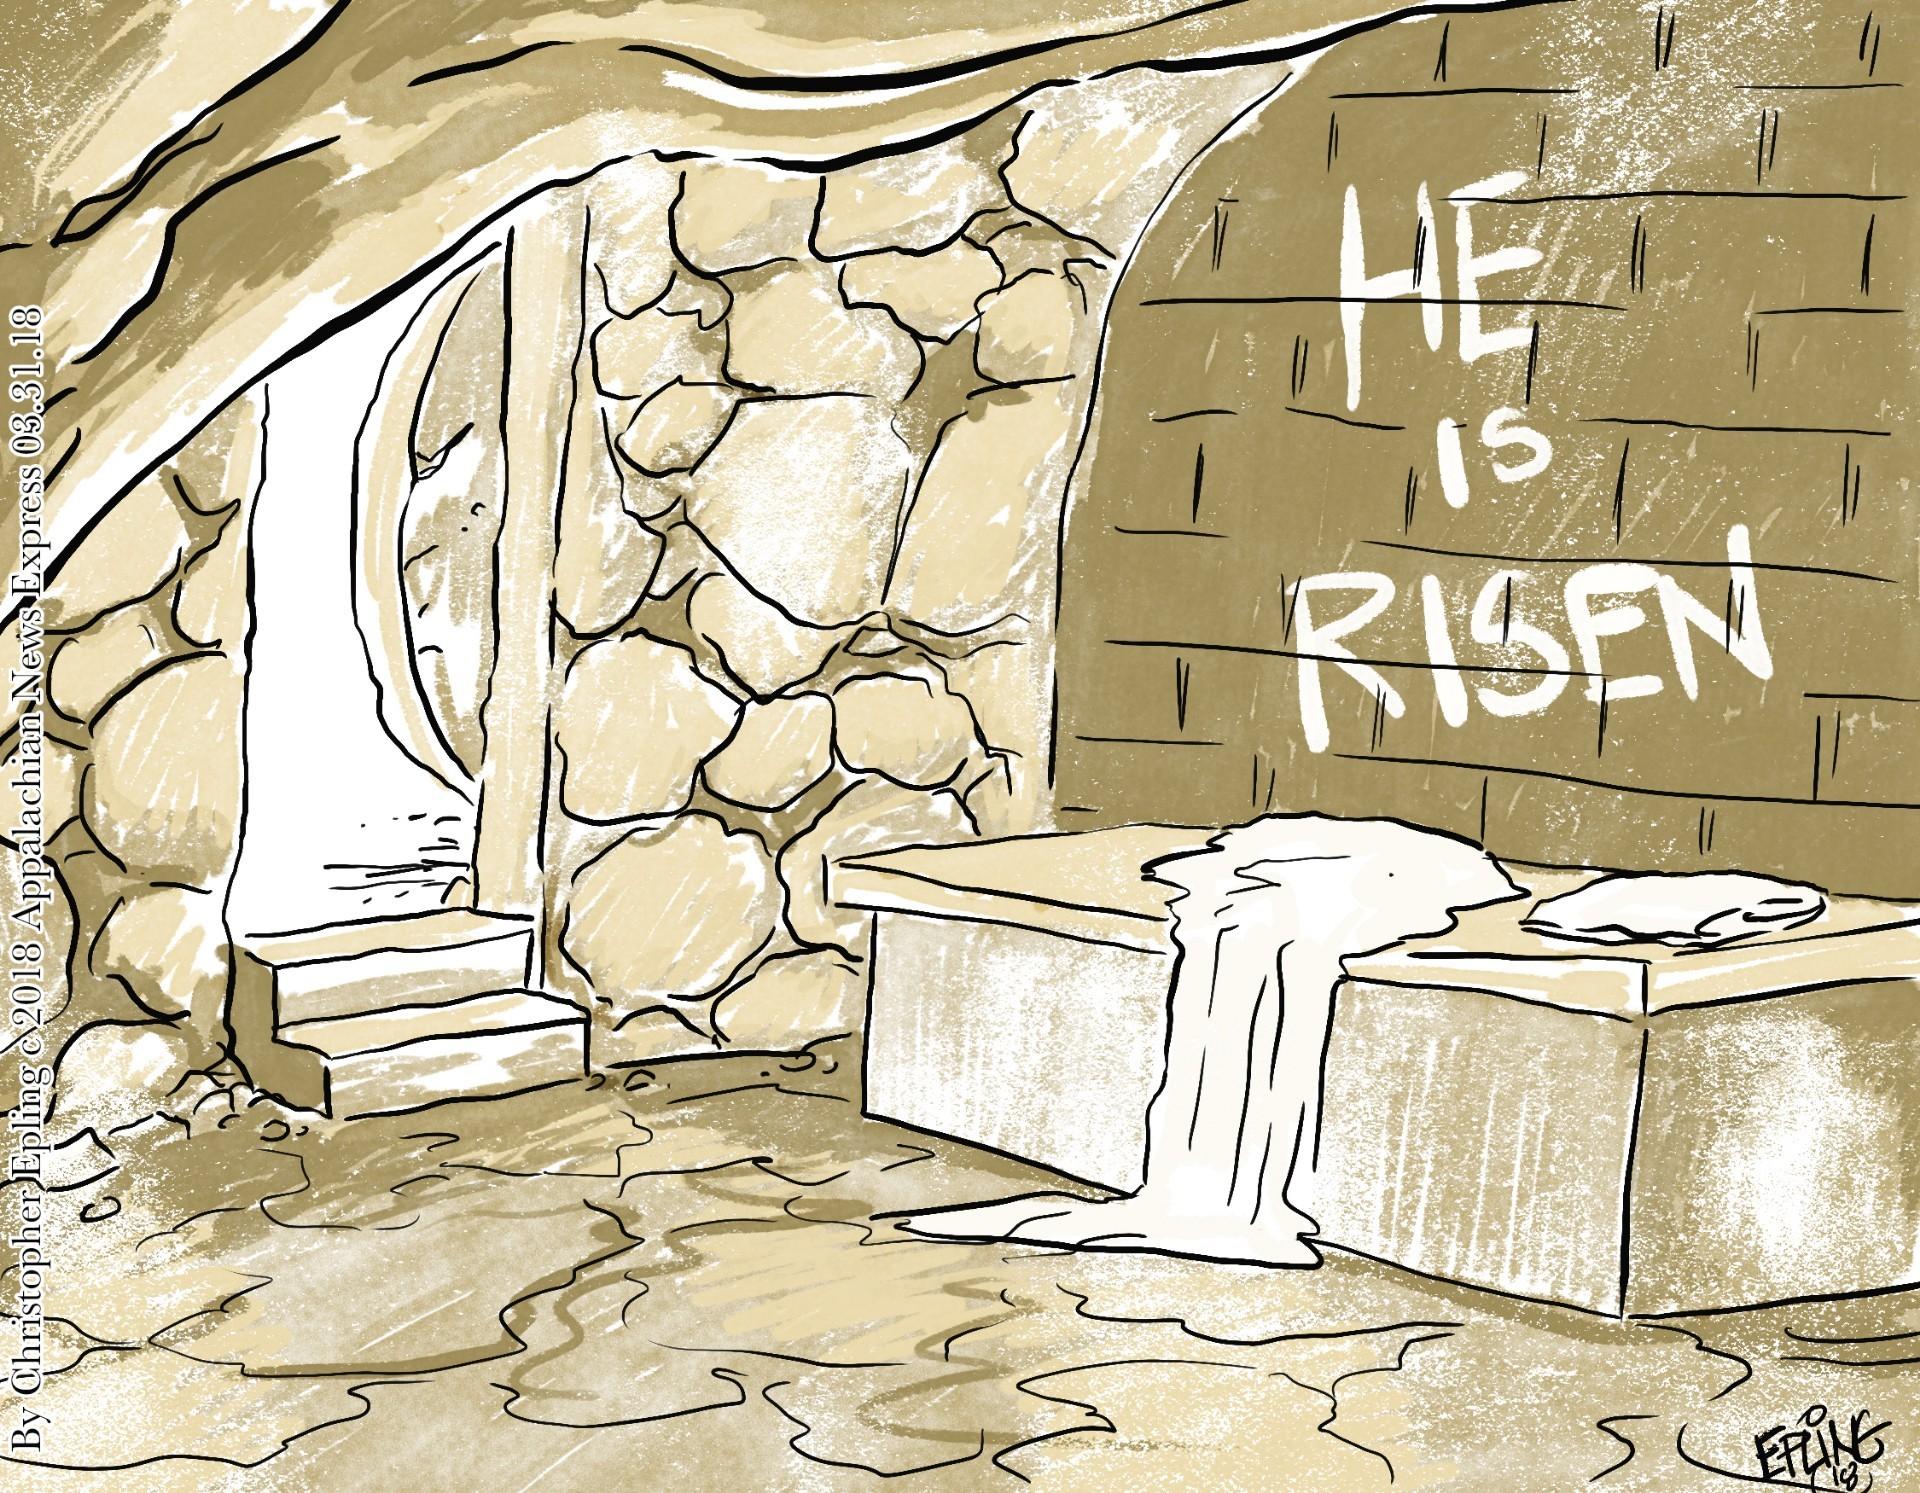 Epling Easter ANE 03.31.18